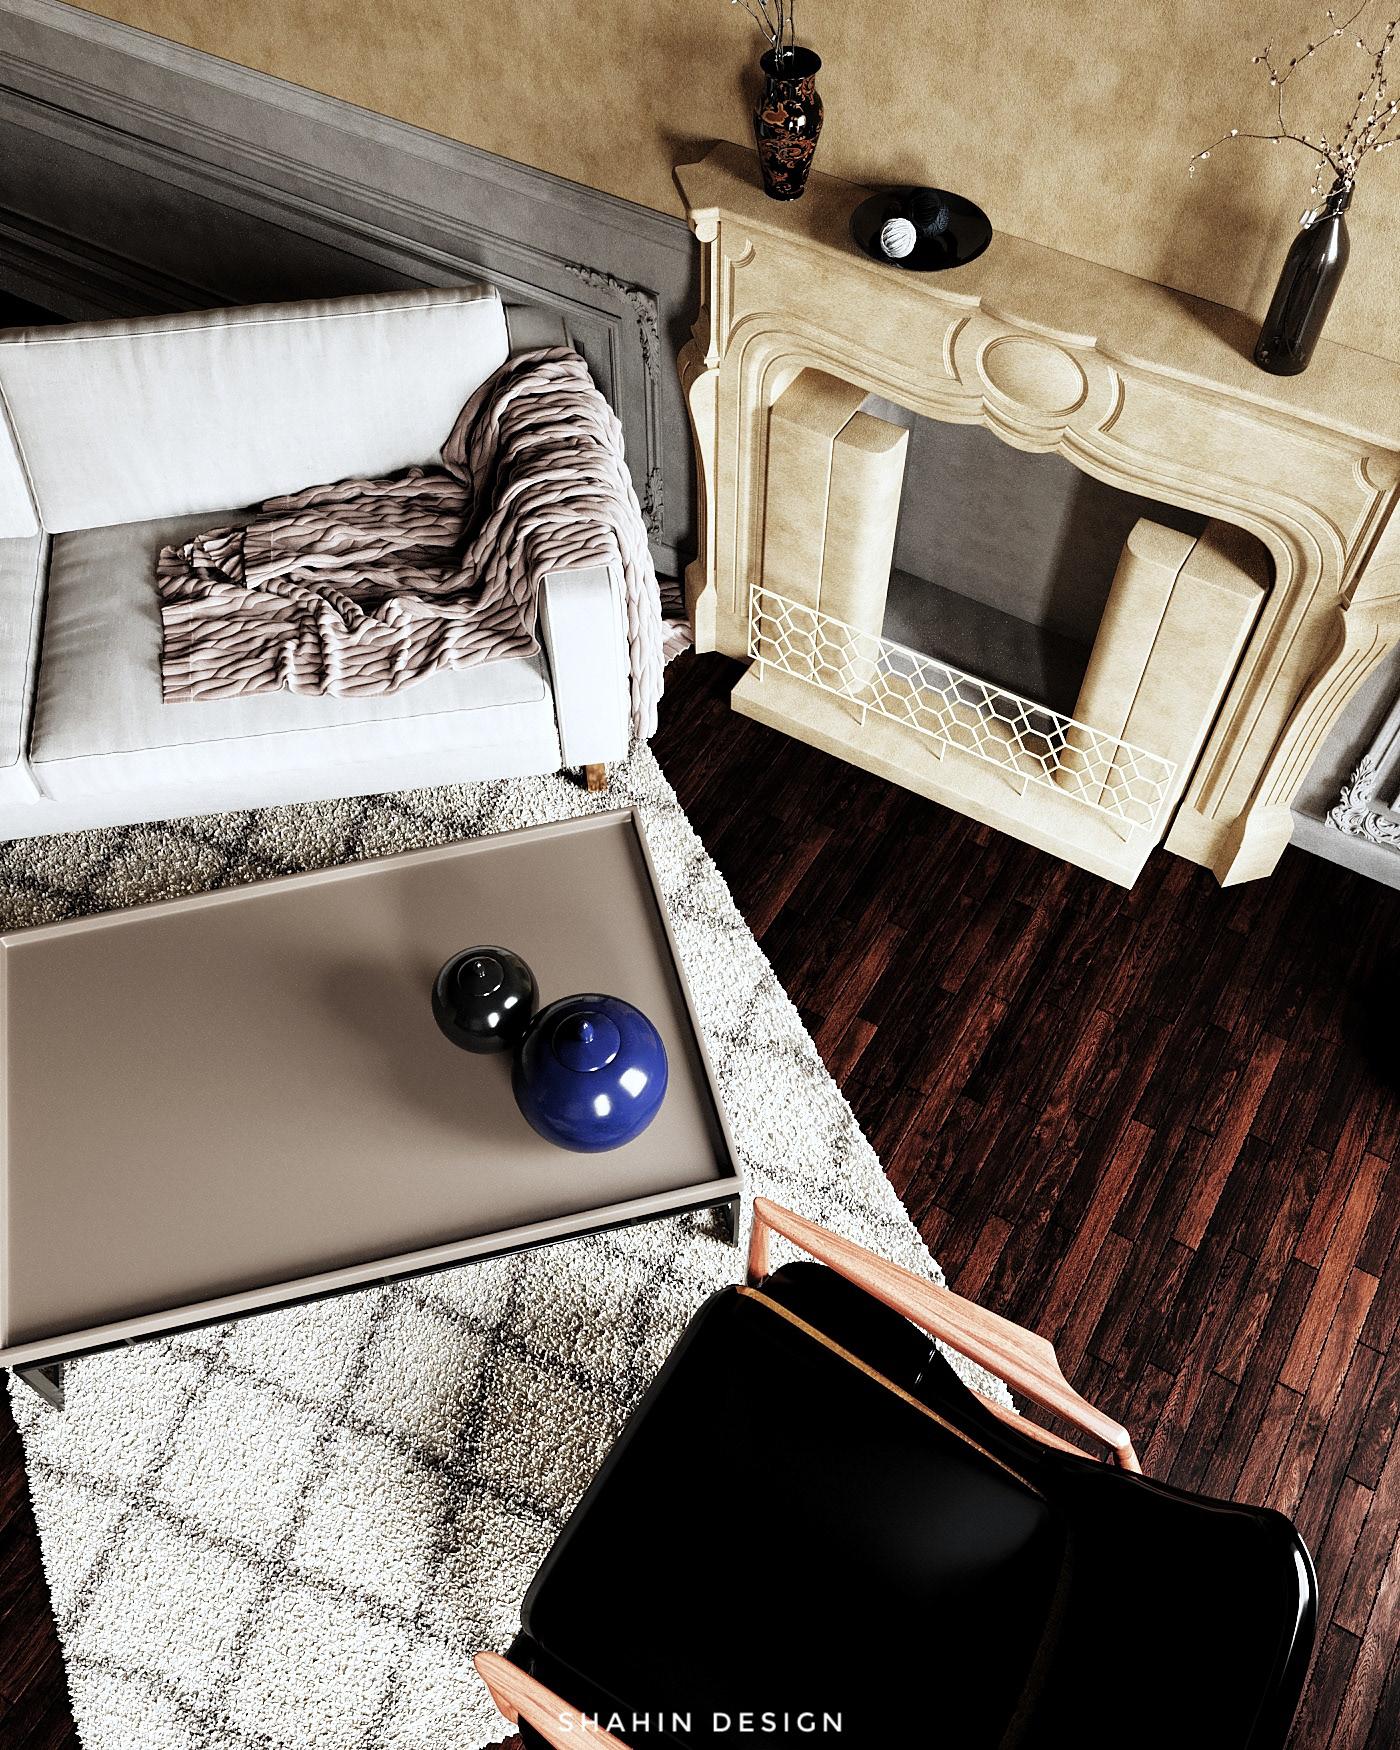 3ds max archviz CGI corona render  interior design  Interior Visualization Moody Interior Render